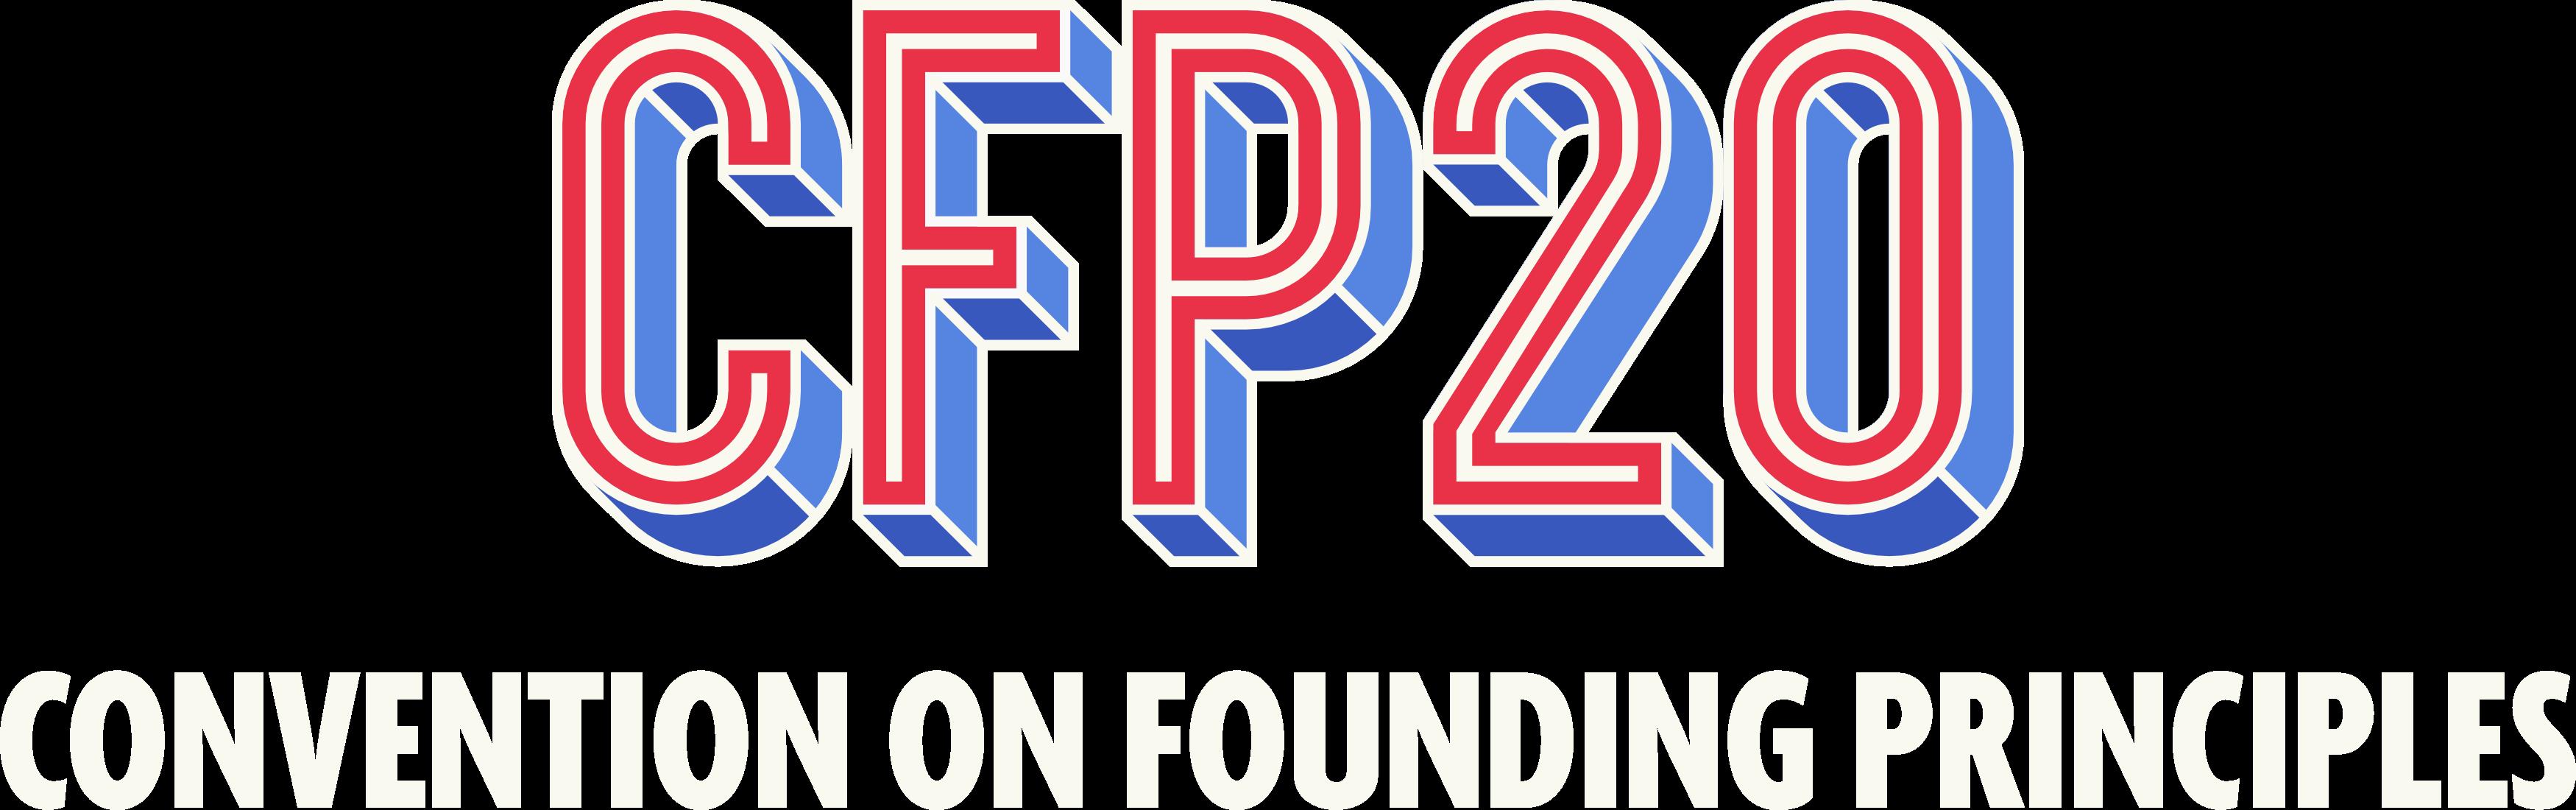 CFP2020